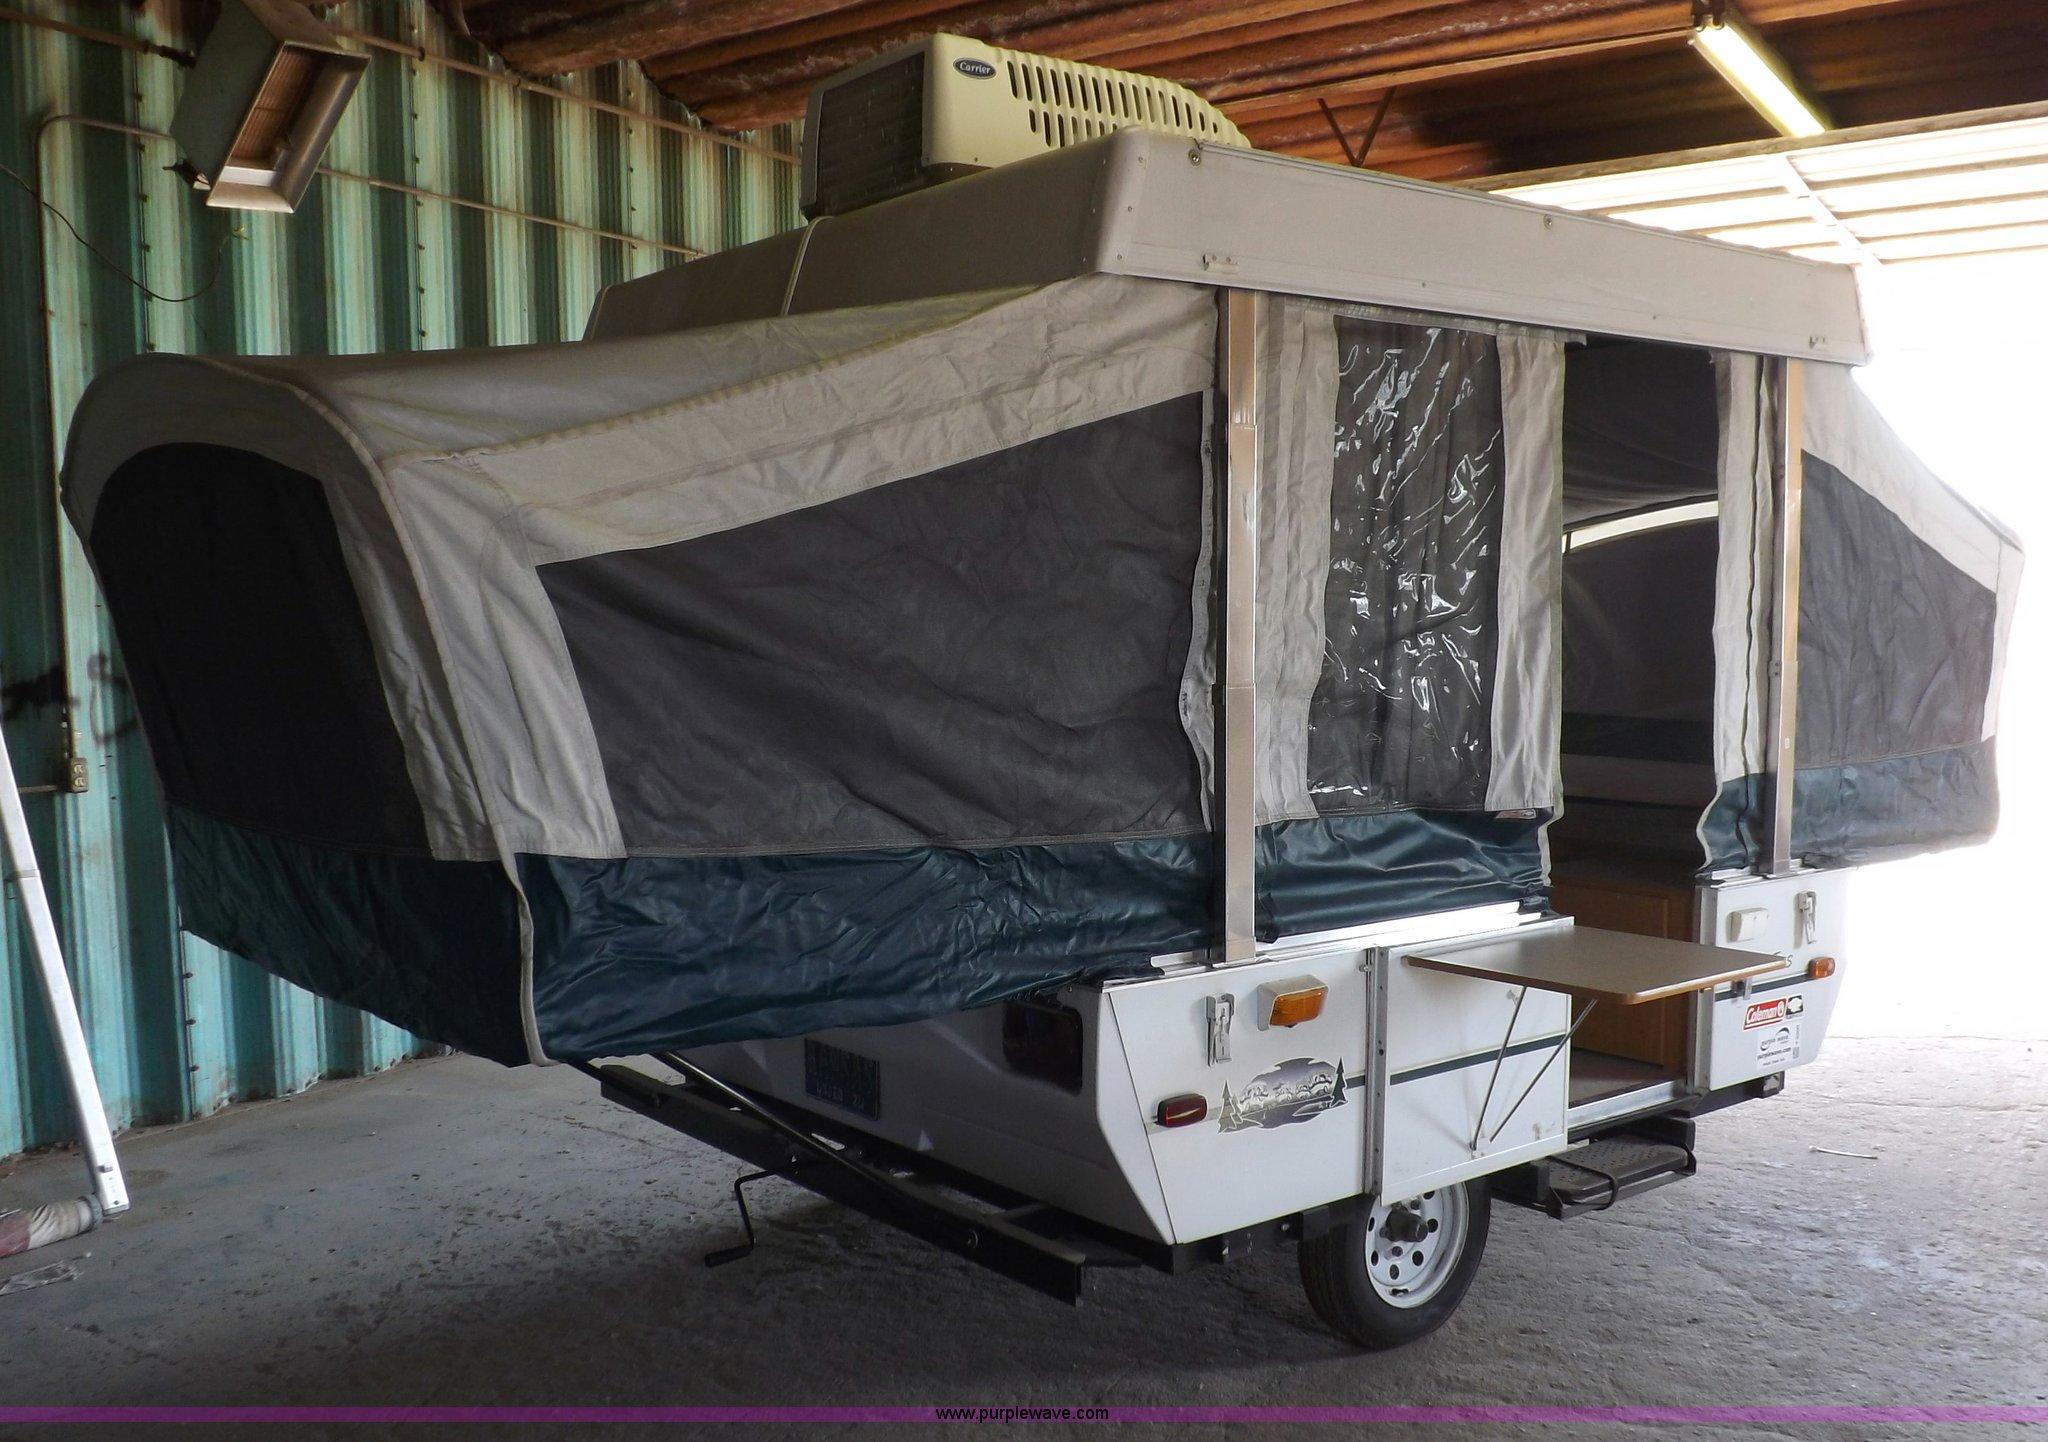 2001 Coleman Taos popup camper | Item F6200 | SOLD! Wednesda